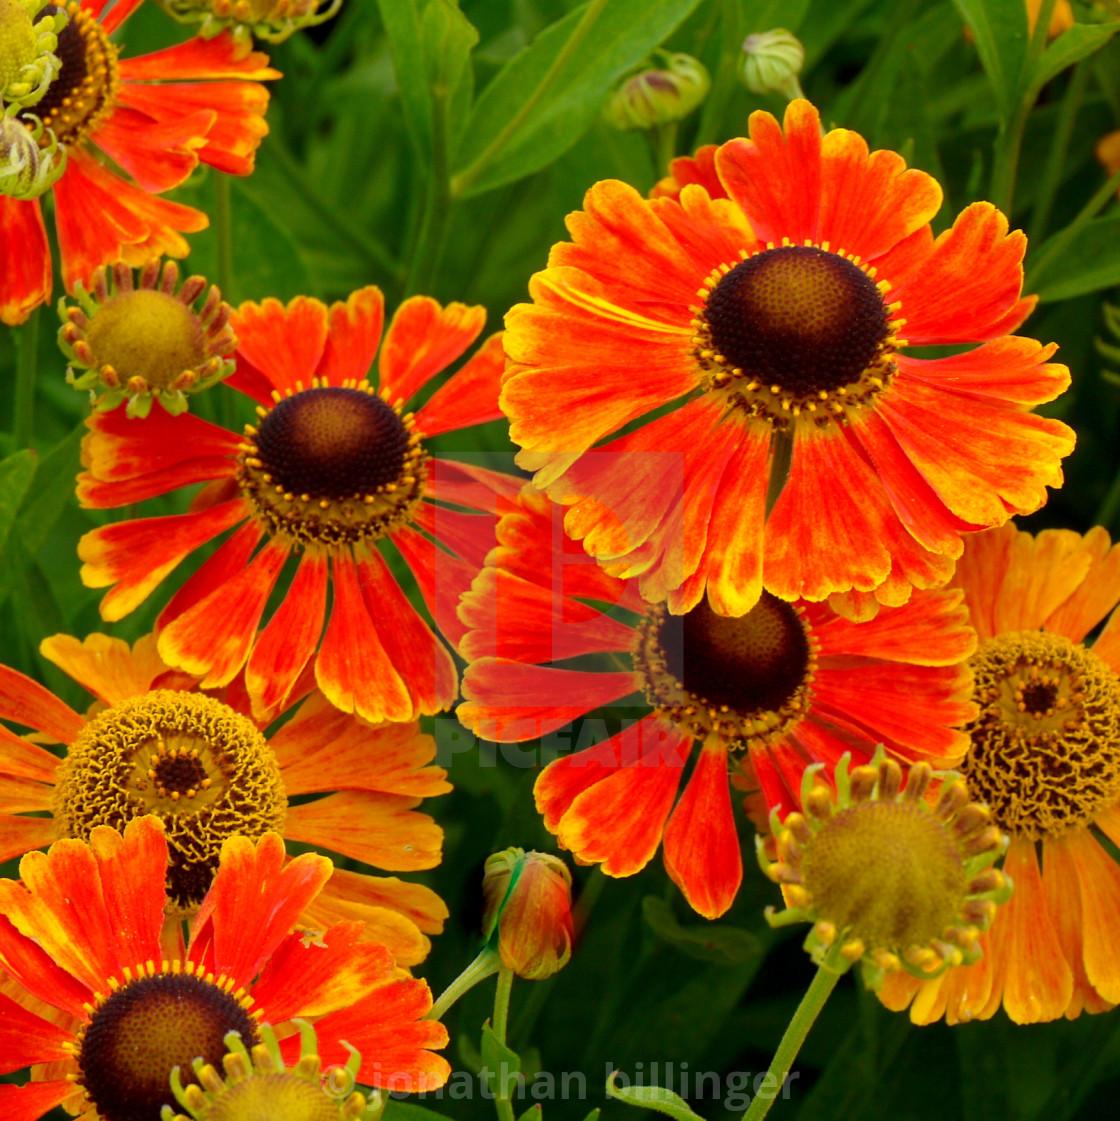 """Helenium autumnale 'Moerheim Beauty', 2"" stock image"